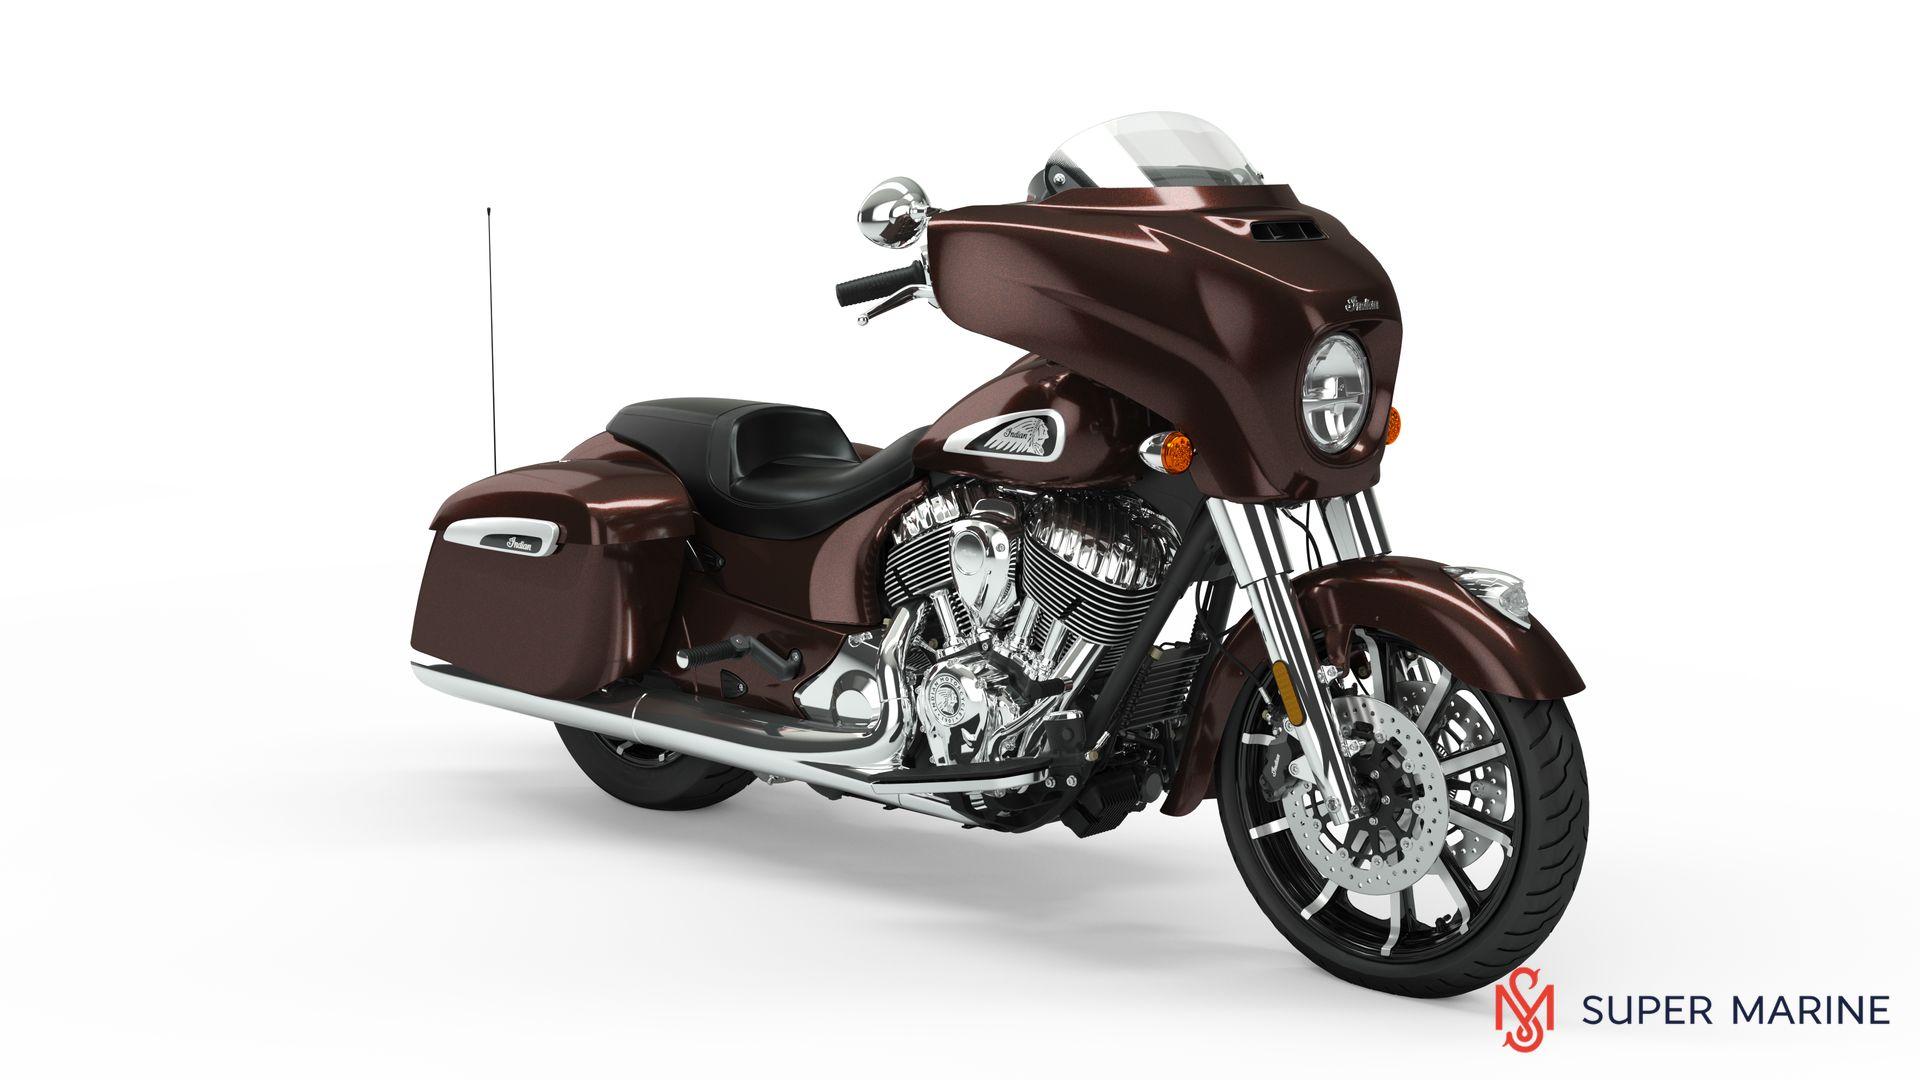 Мотоцикл Indian Chieftain Limited Dark Walnut 2019 - 1